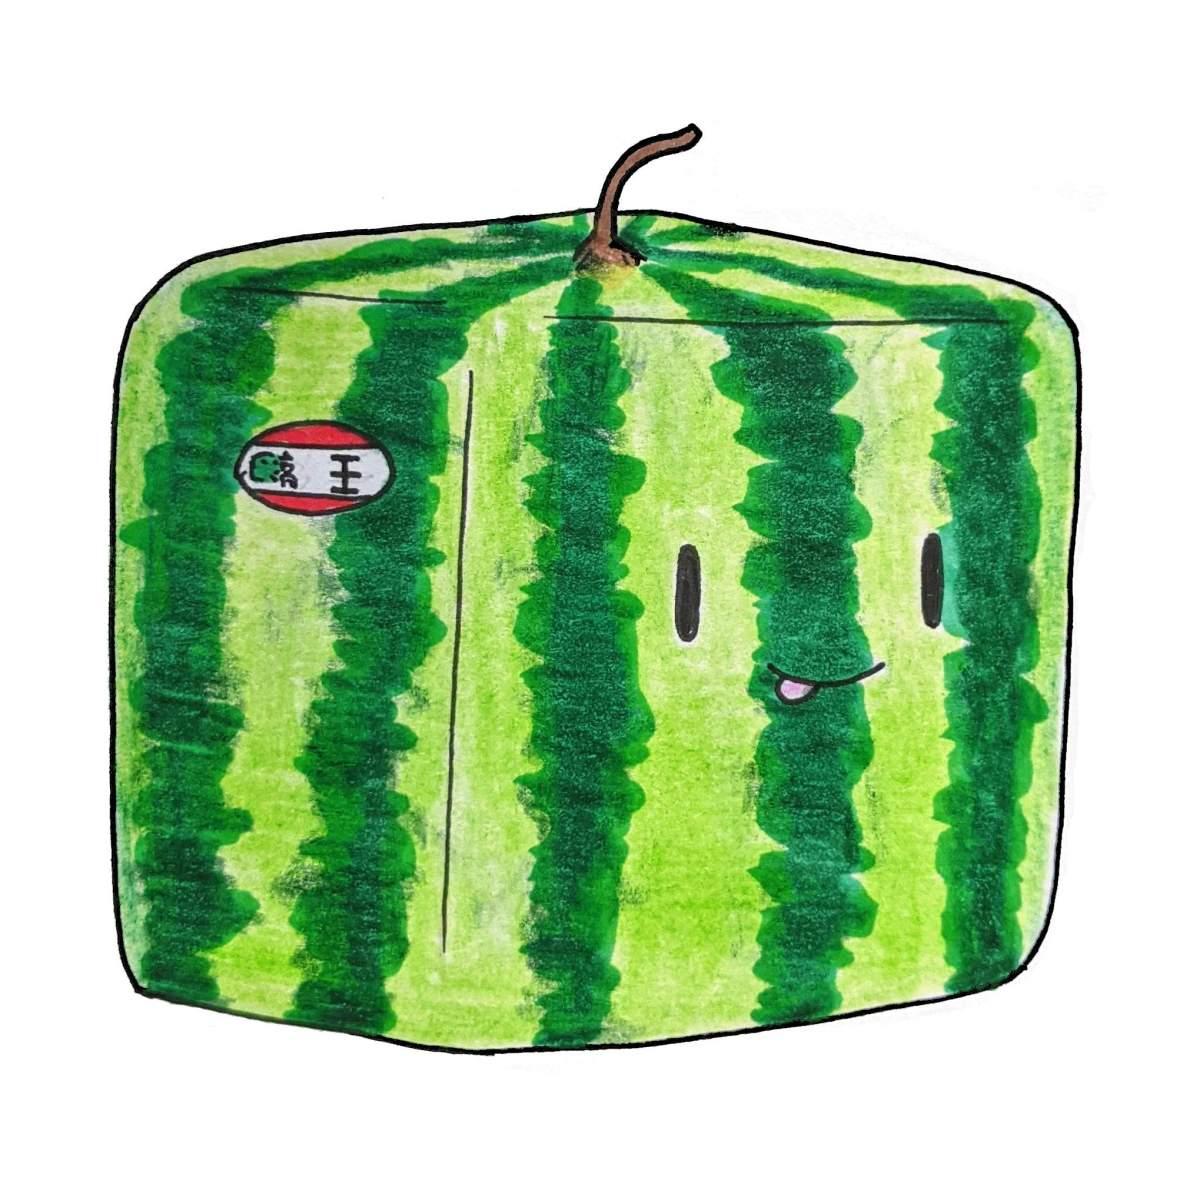 Kawaii square watermelon Japanese expensive fruit cute